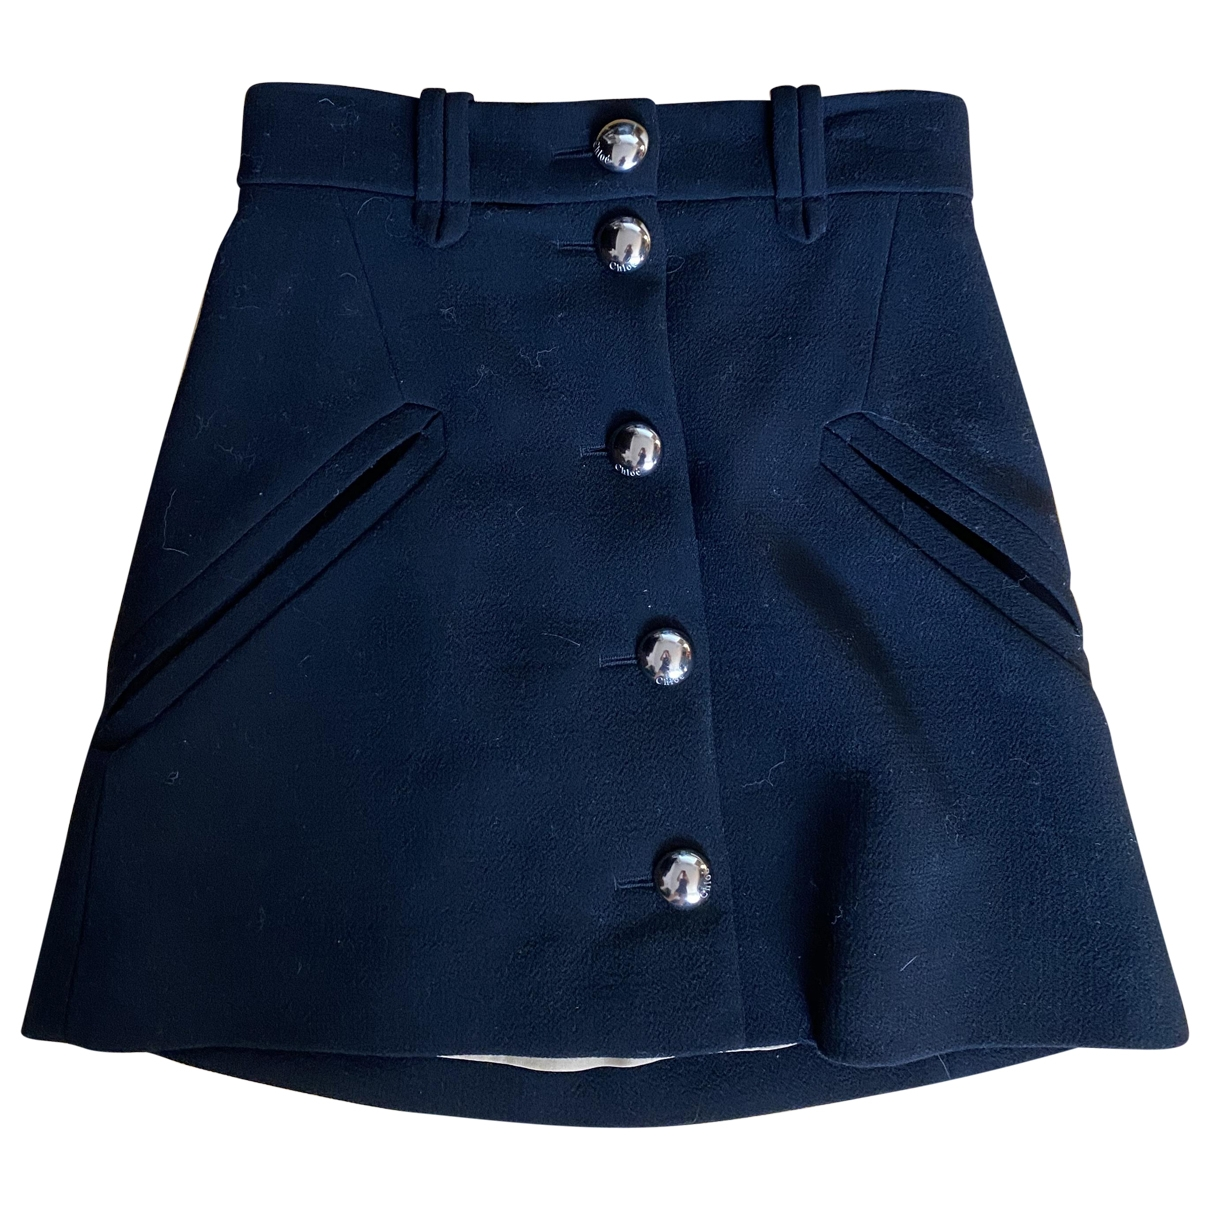 Mini falda de Lana Chloe